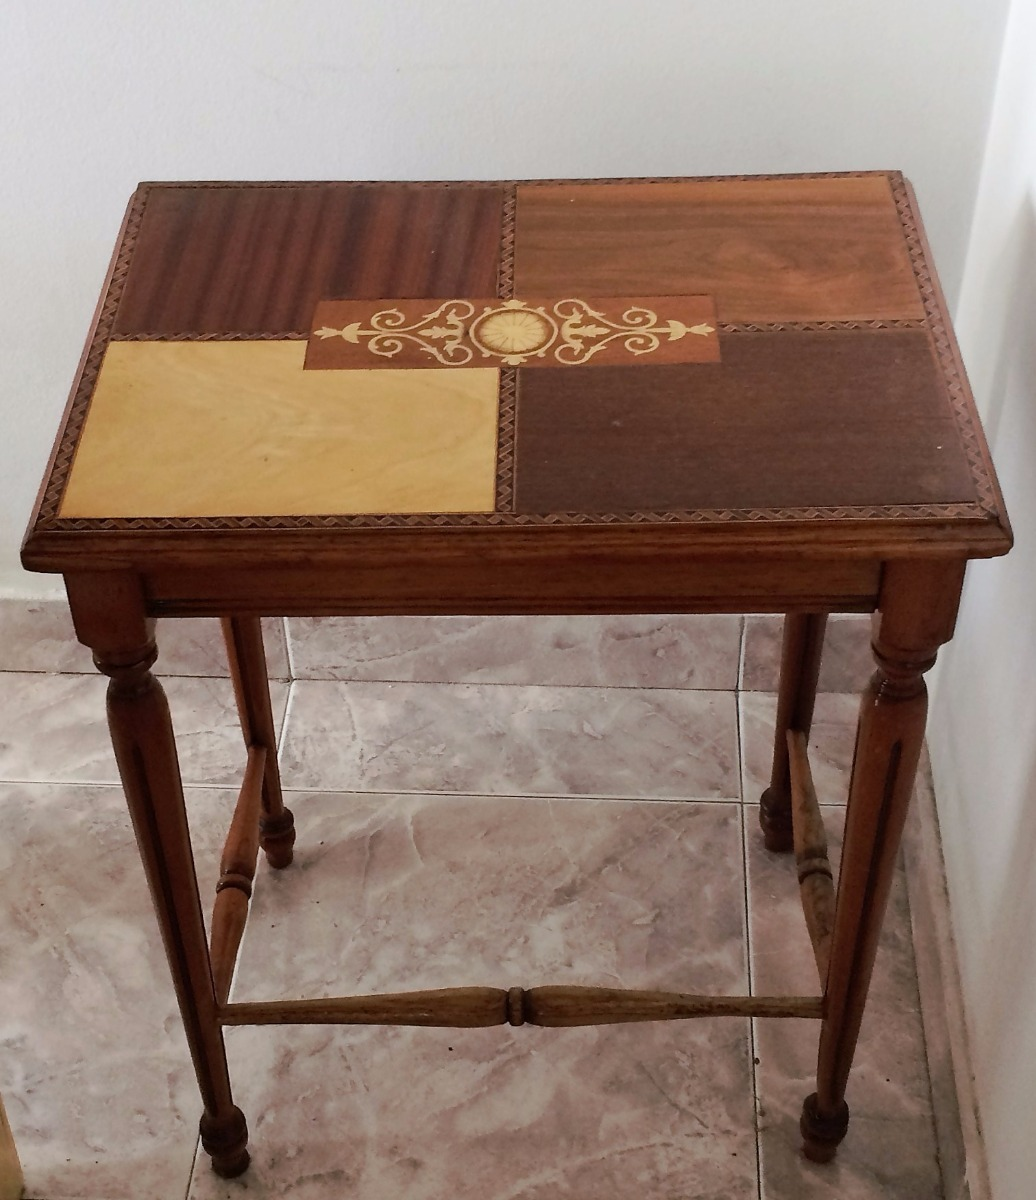 Mesa En Madera Incrustaciones De Taracea 100 000 En Mercado Libre # Muebles Taracea